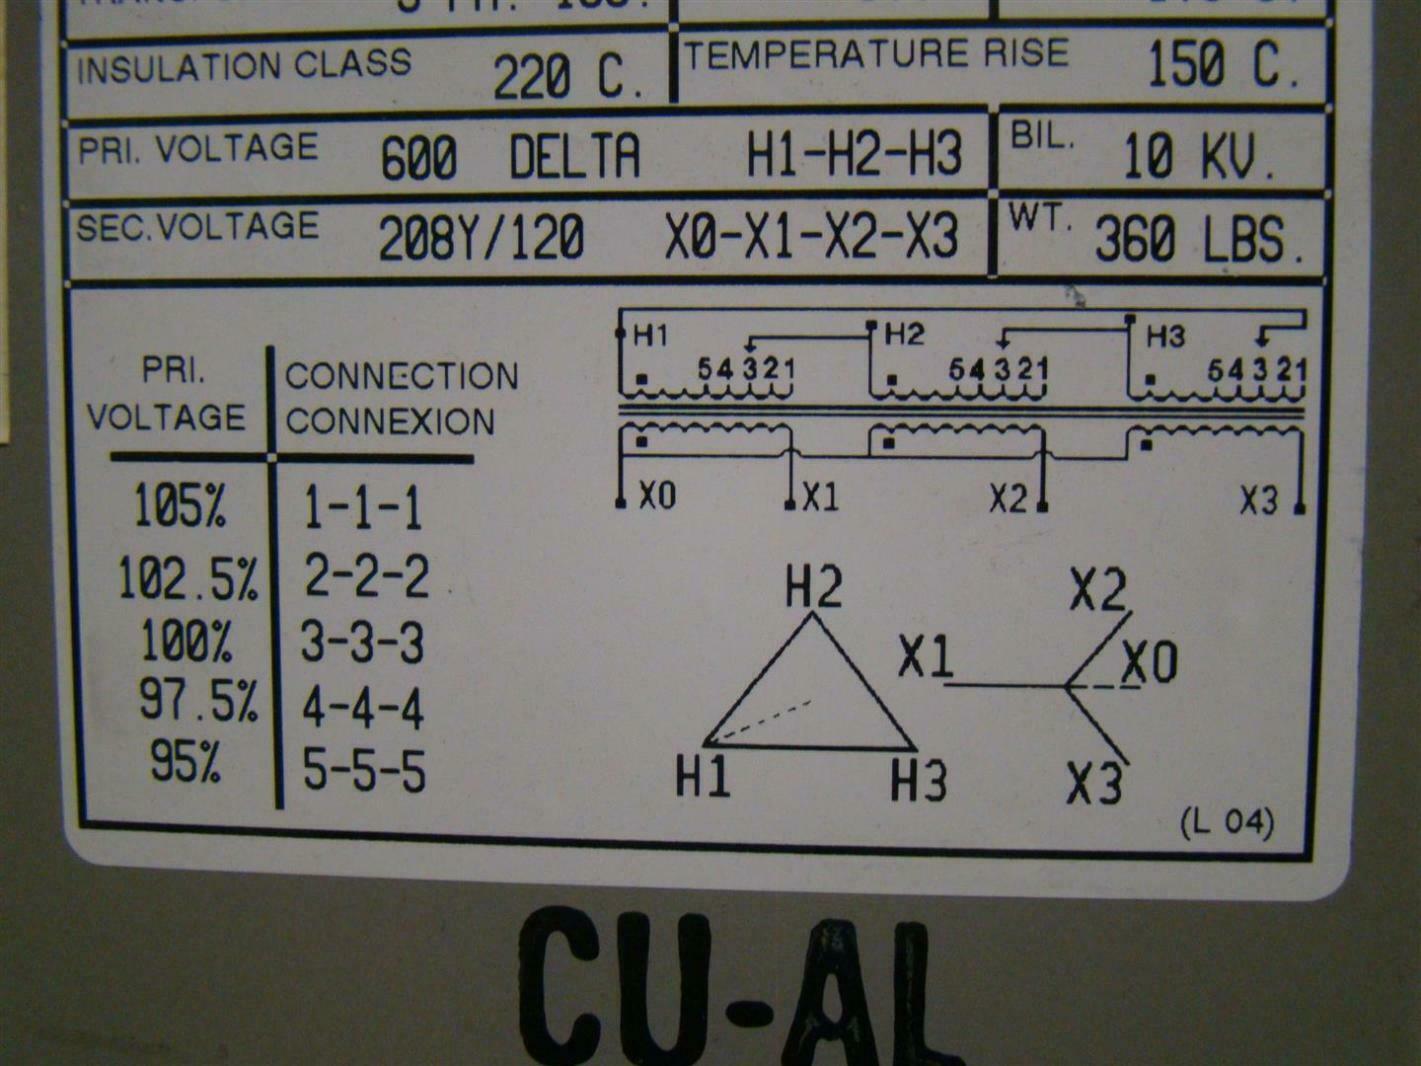 Rex Manufacturing Transformer Wiring Diagram 3ph Iso 45kva 600dx208y 120 Bc45jm Ebay 480 Volt